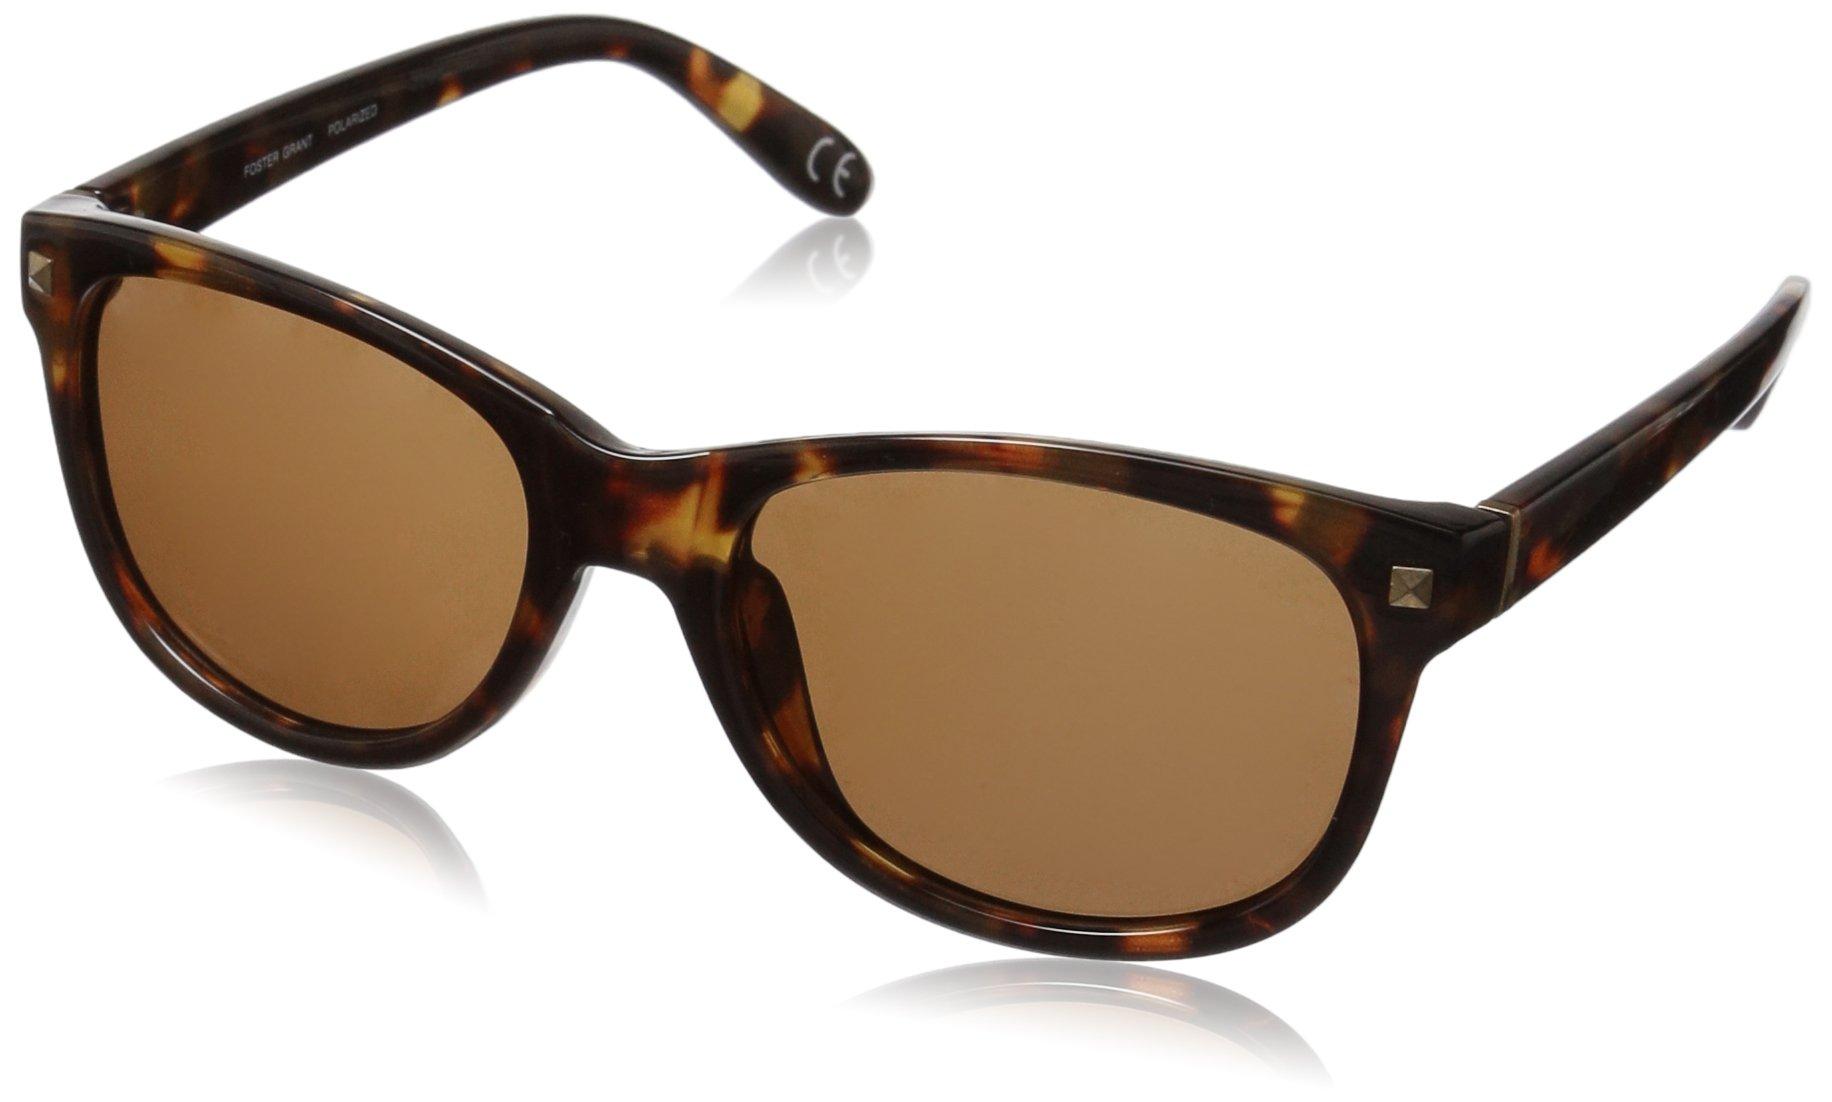 Foster Grant Women's Sutton Pol Polarized Wayfarer Sunglasses, Tortoise, 51.5 mm